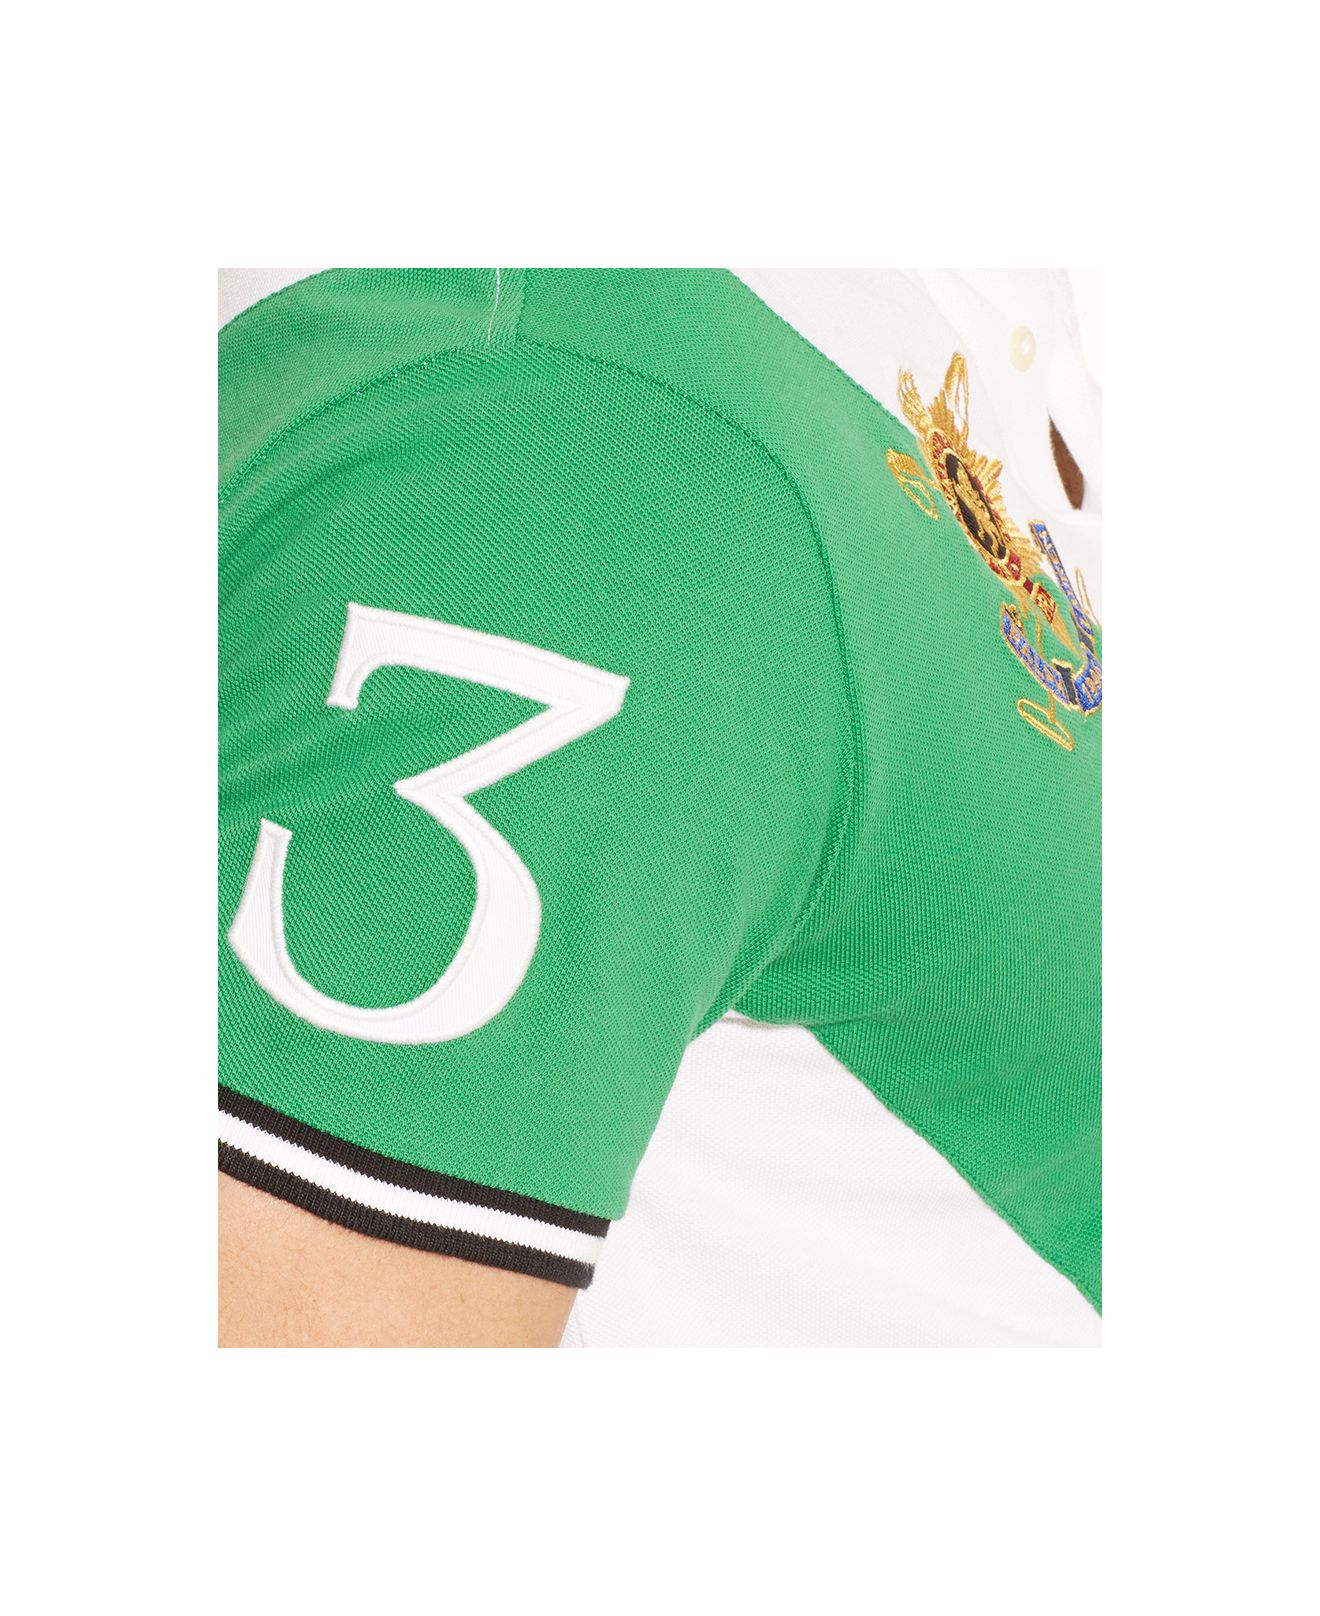 Polo Ralph Lauren | Green Black Watch Custom-Fit Banner-Stripe Polo for Men. View Fullscreen